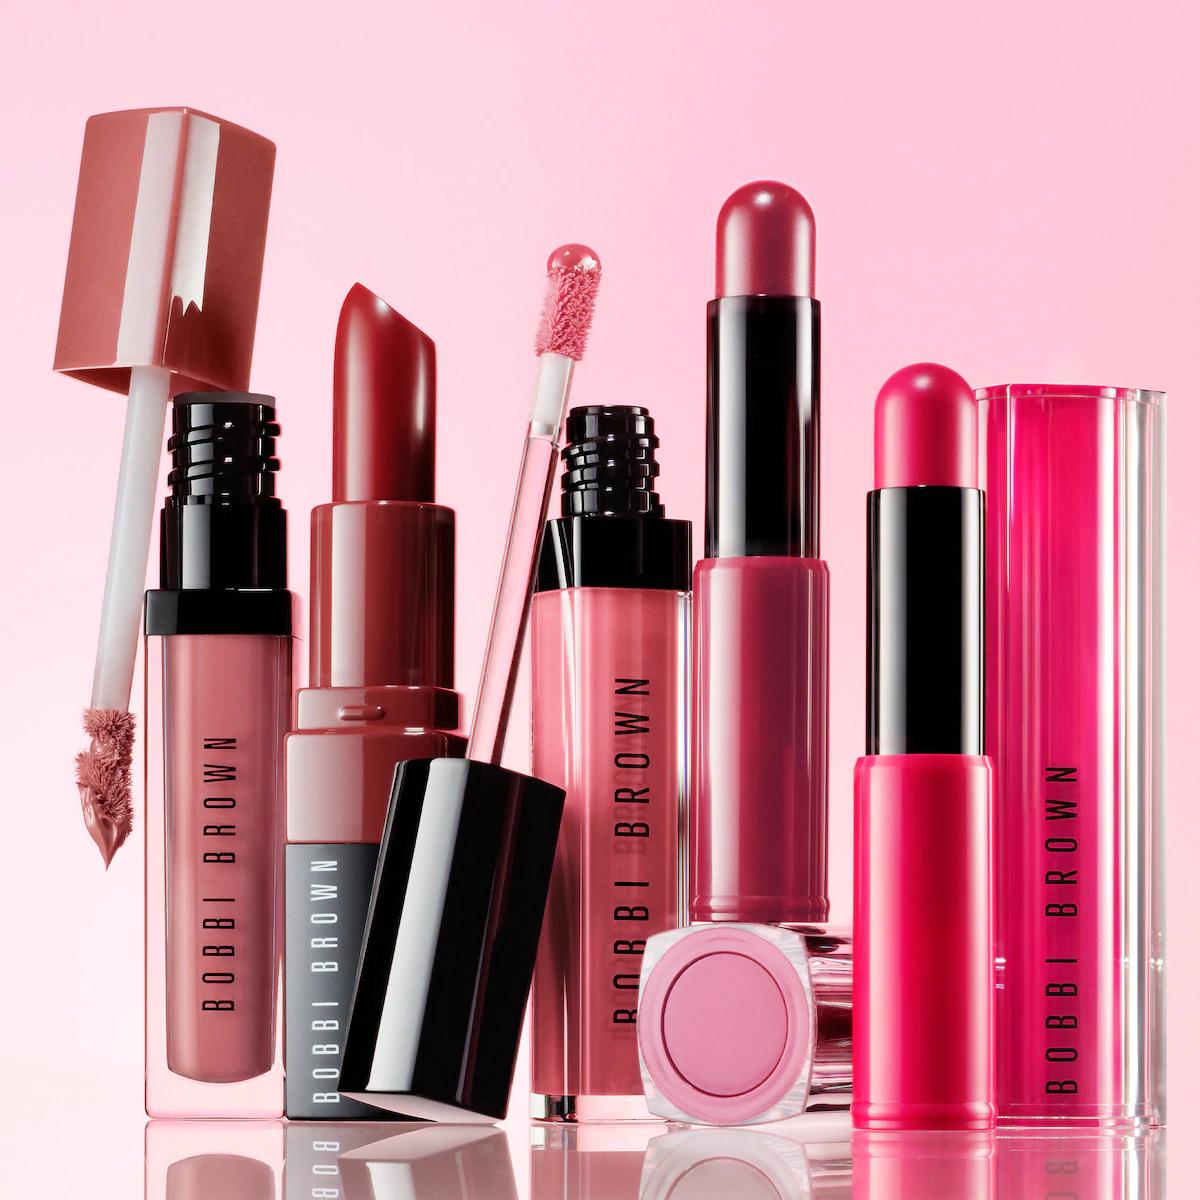 Bobbi Brown Crushed Shine Jelly Stick Lipsticks 1